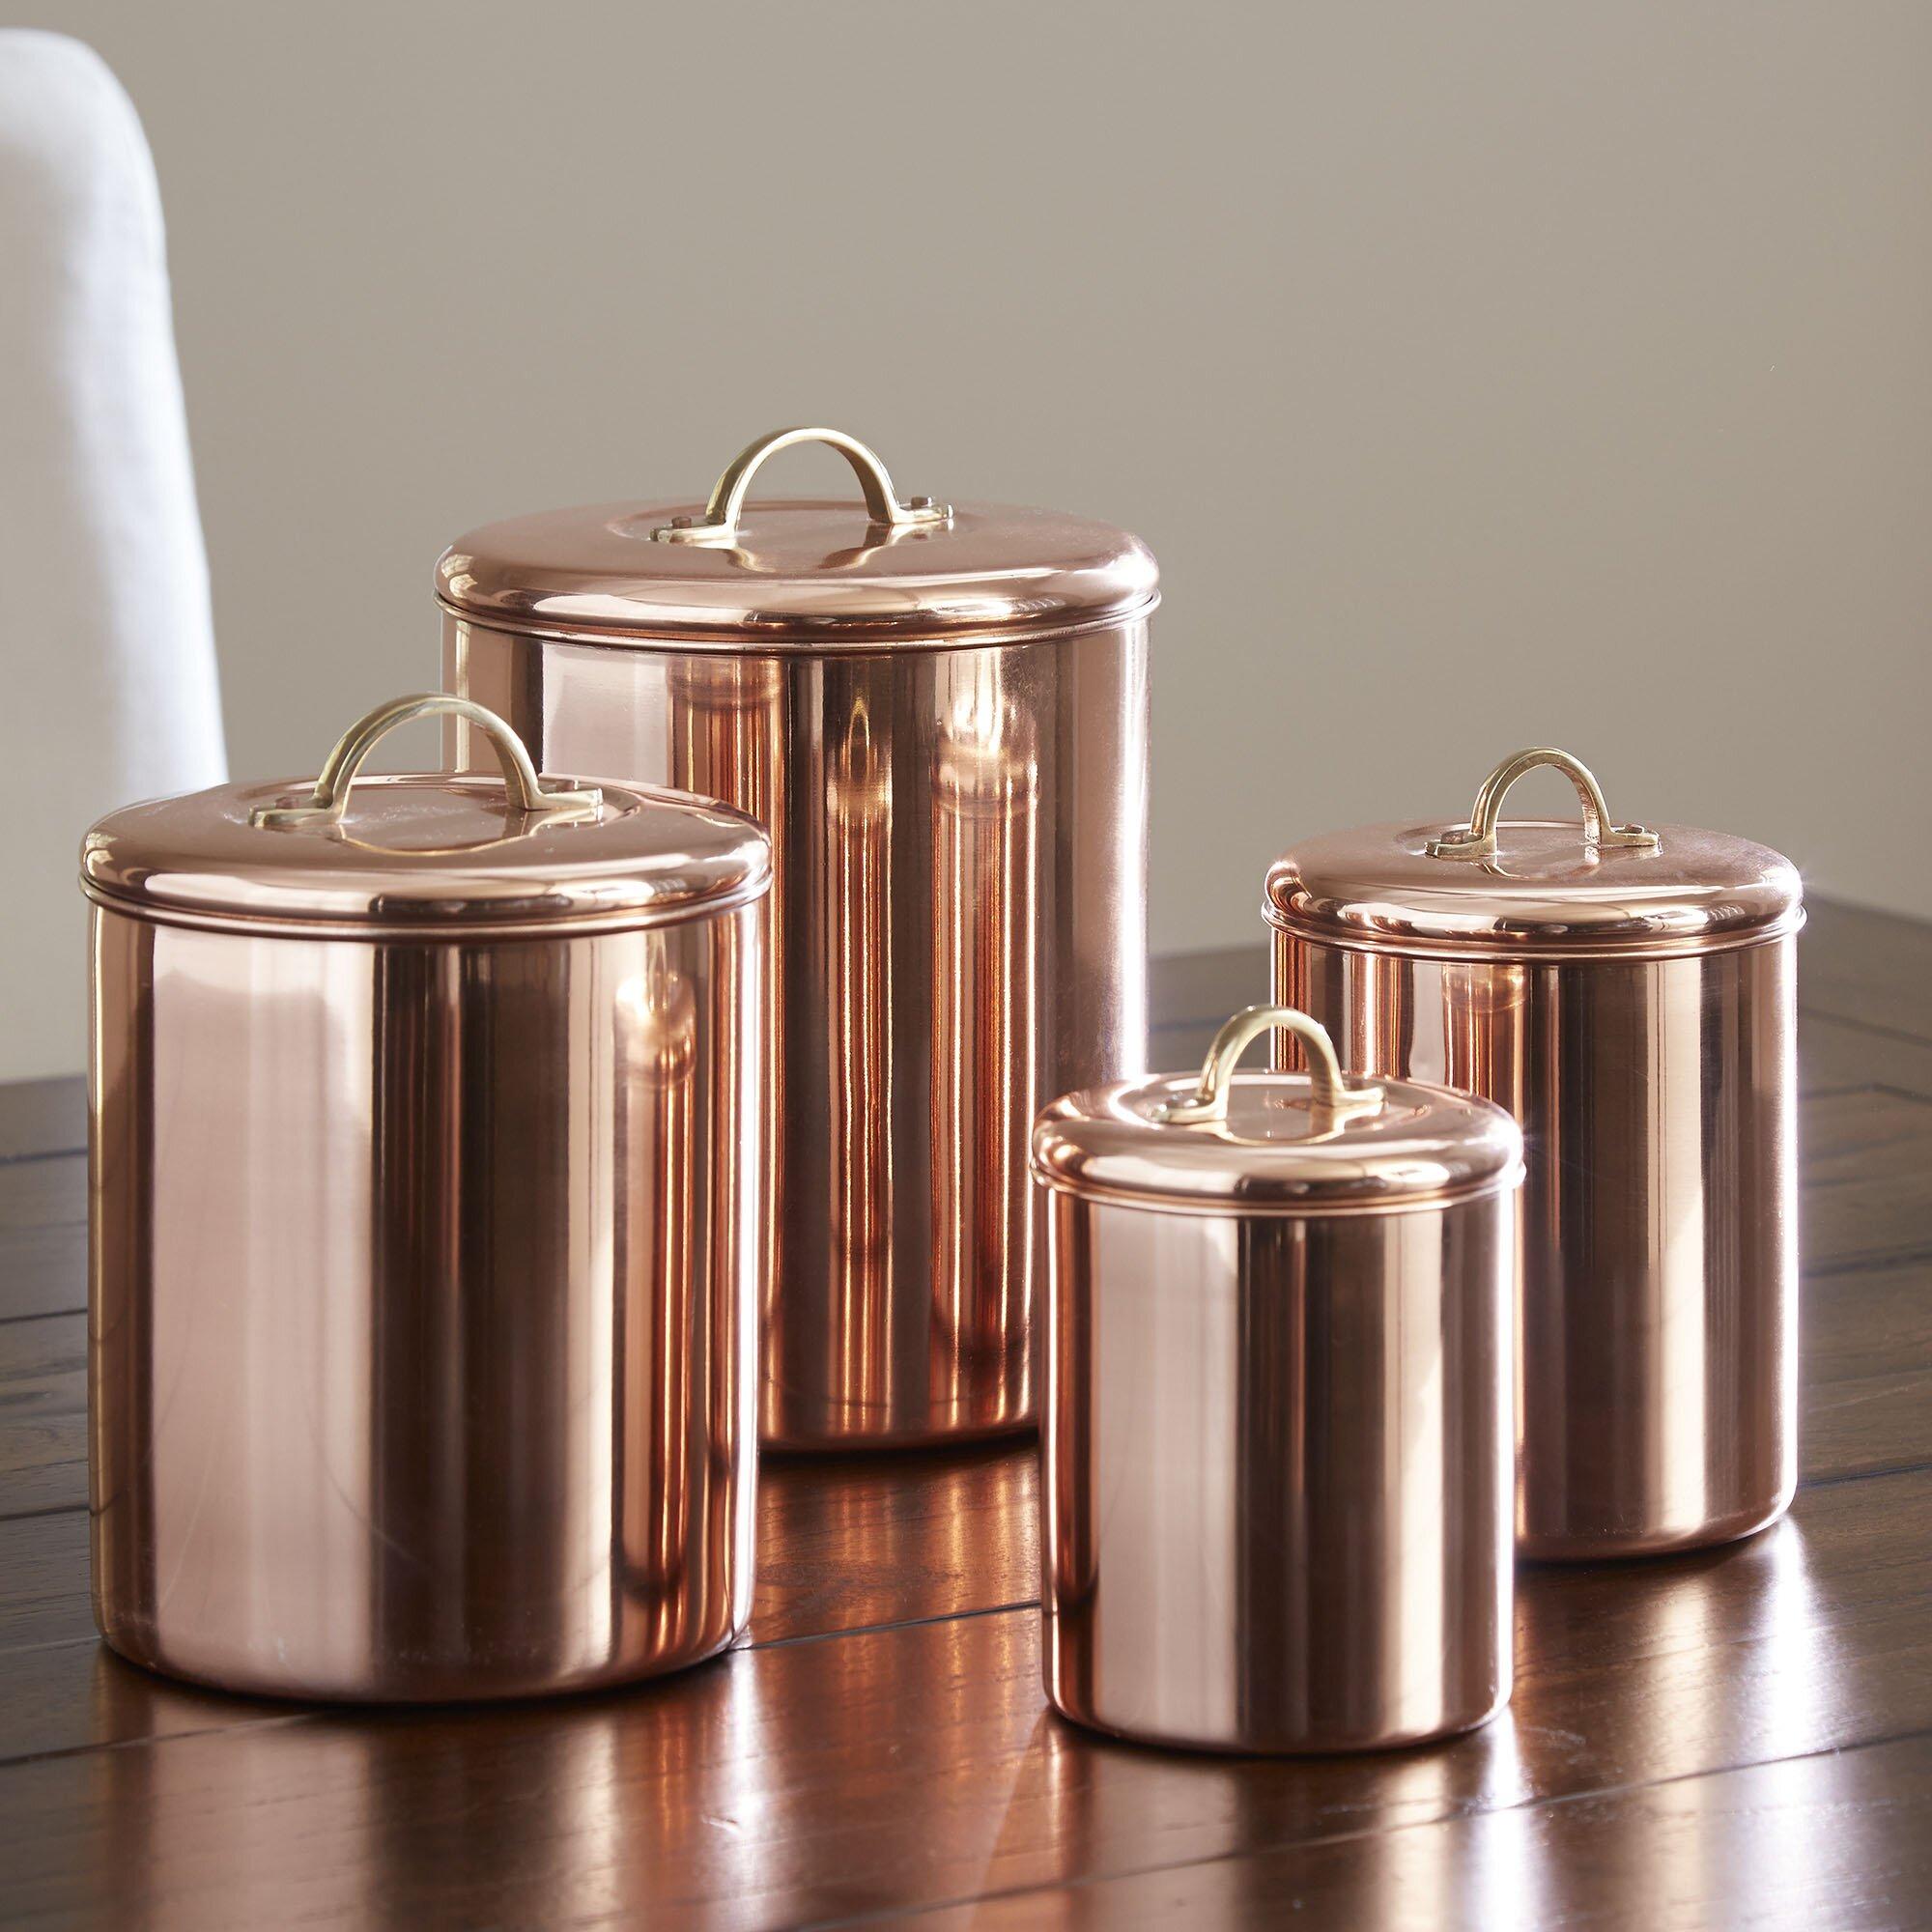 canister set etsy rustic kitchen canister set detrit us koppel 4 piece kitchen canister set reviews birch lane